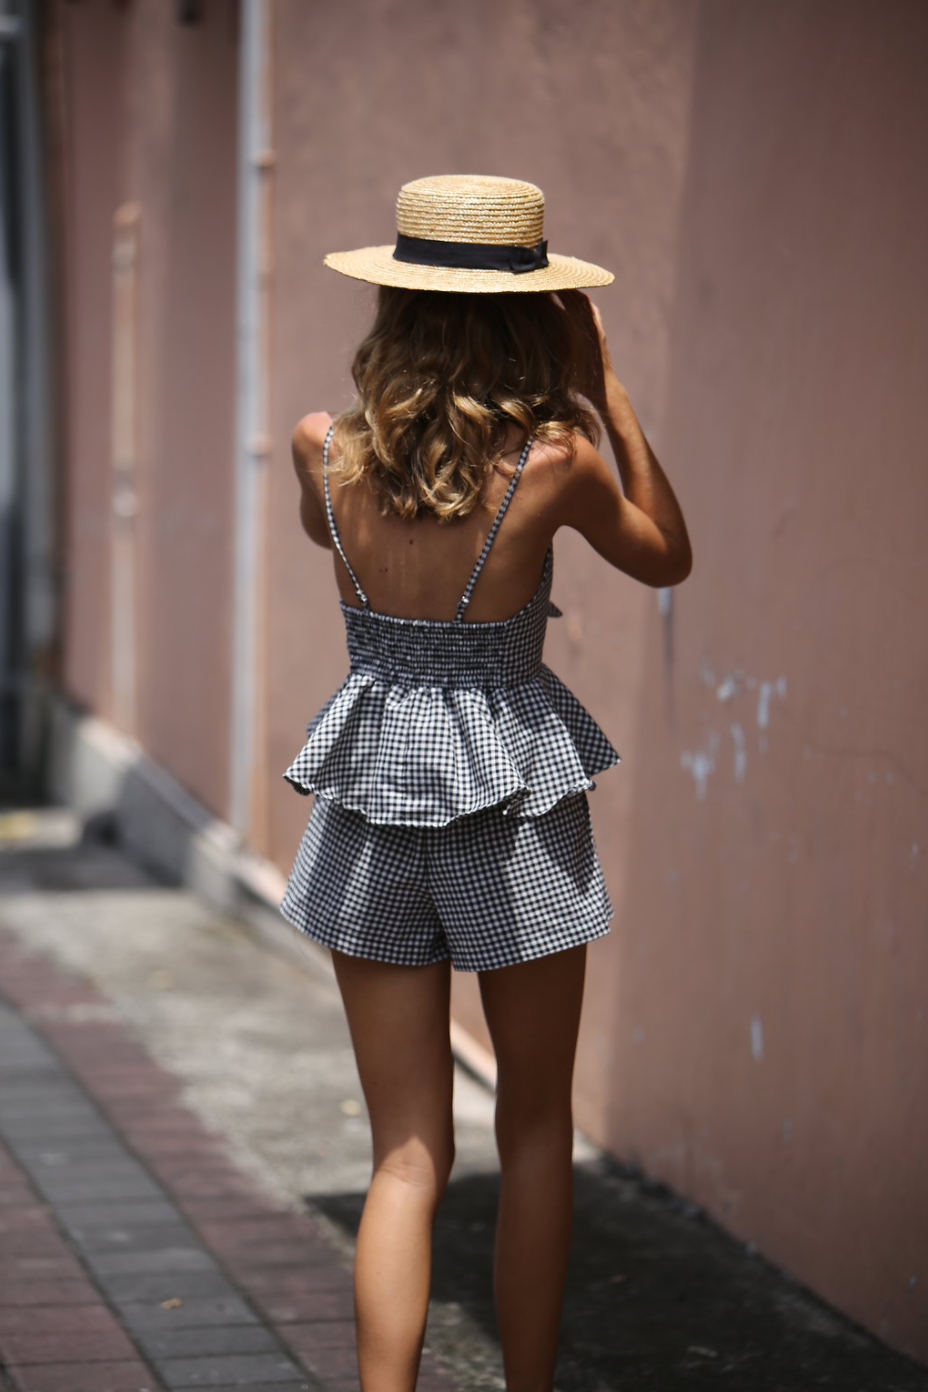 845decfd Summer Fashion Trends I'm Loving | Summer outfits | Fashion, Summer ...